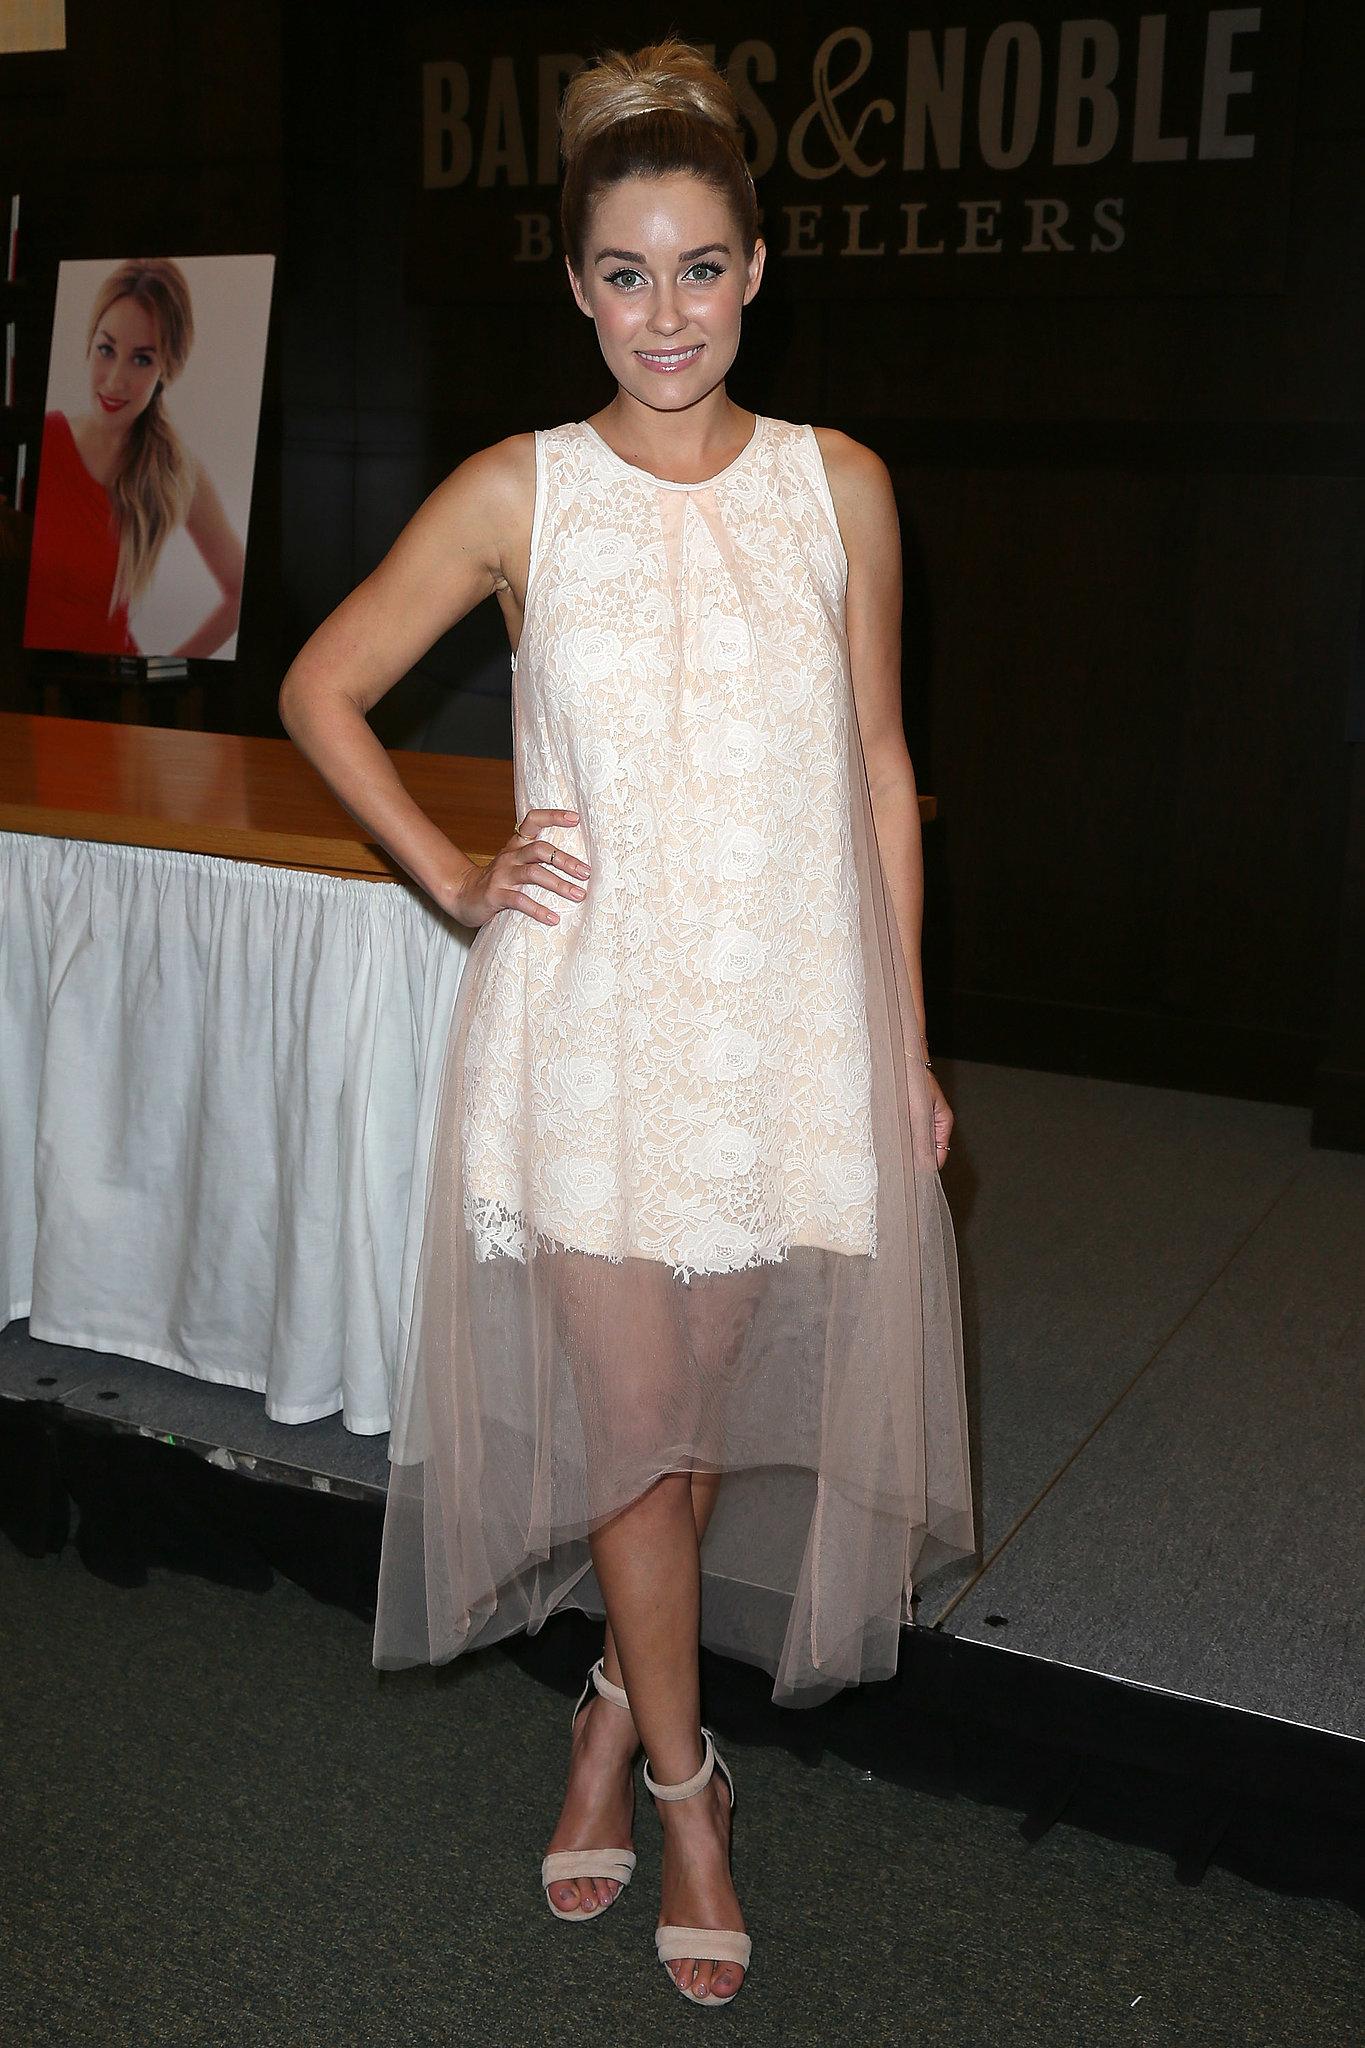 Lauren Conrad showed off a dreamy Summer dress at a book signing in LA.